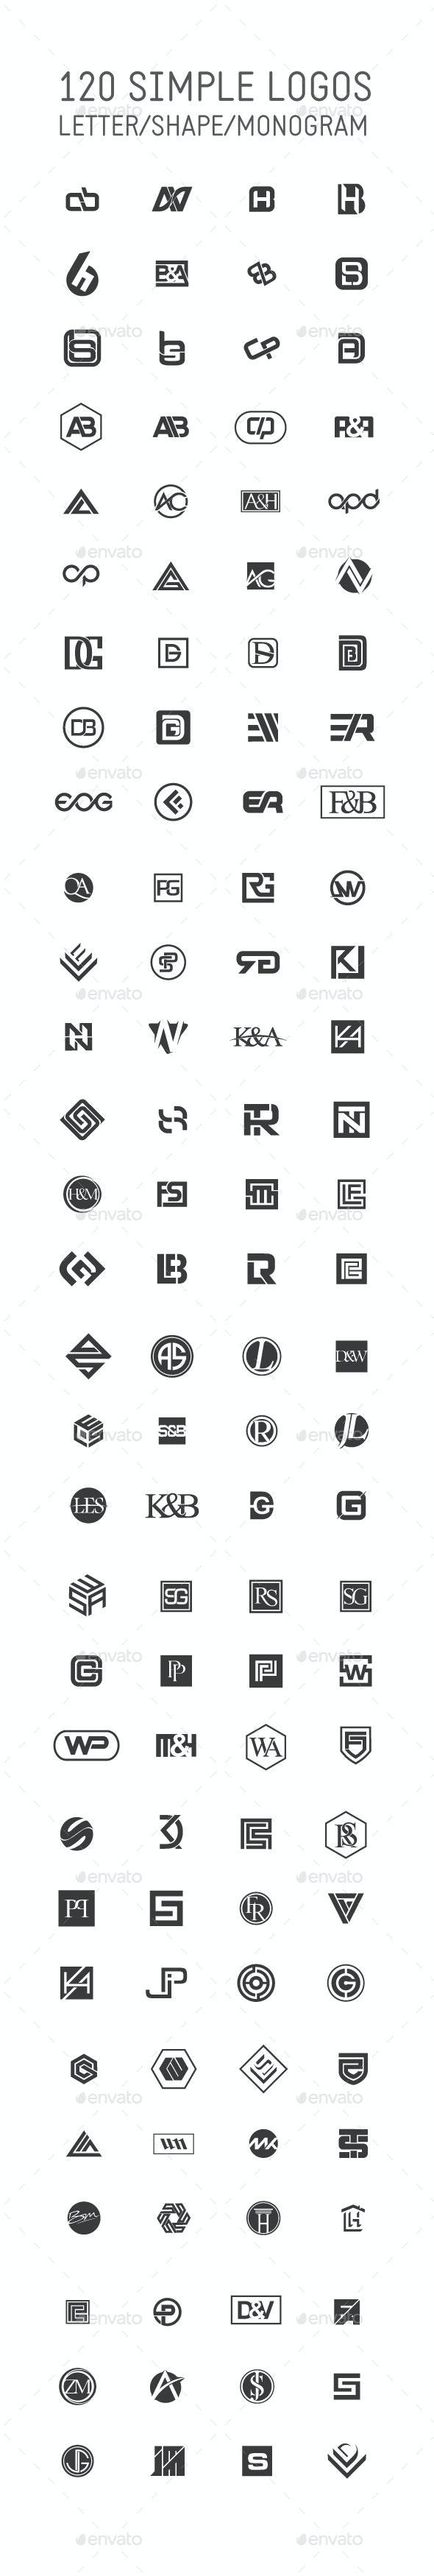 120 Simple Logo Collection - Miscellaneous Web Elements